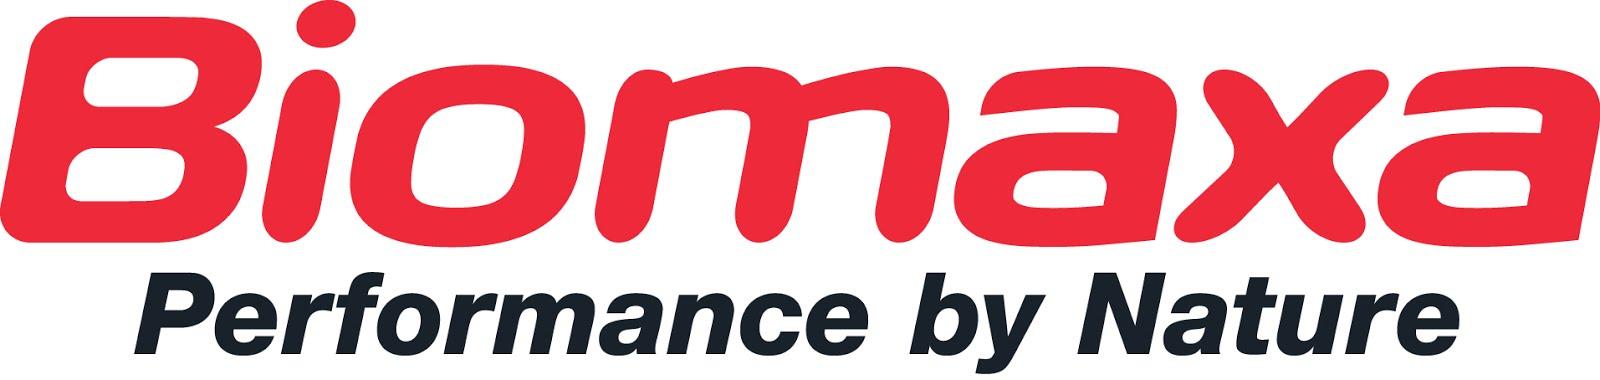 Biomaxa